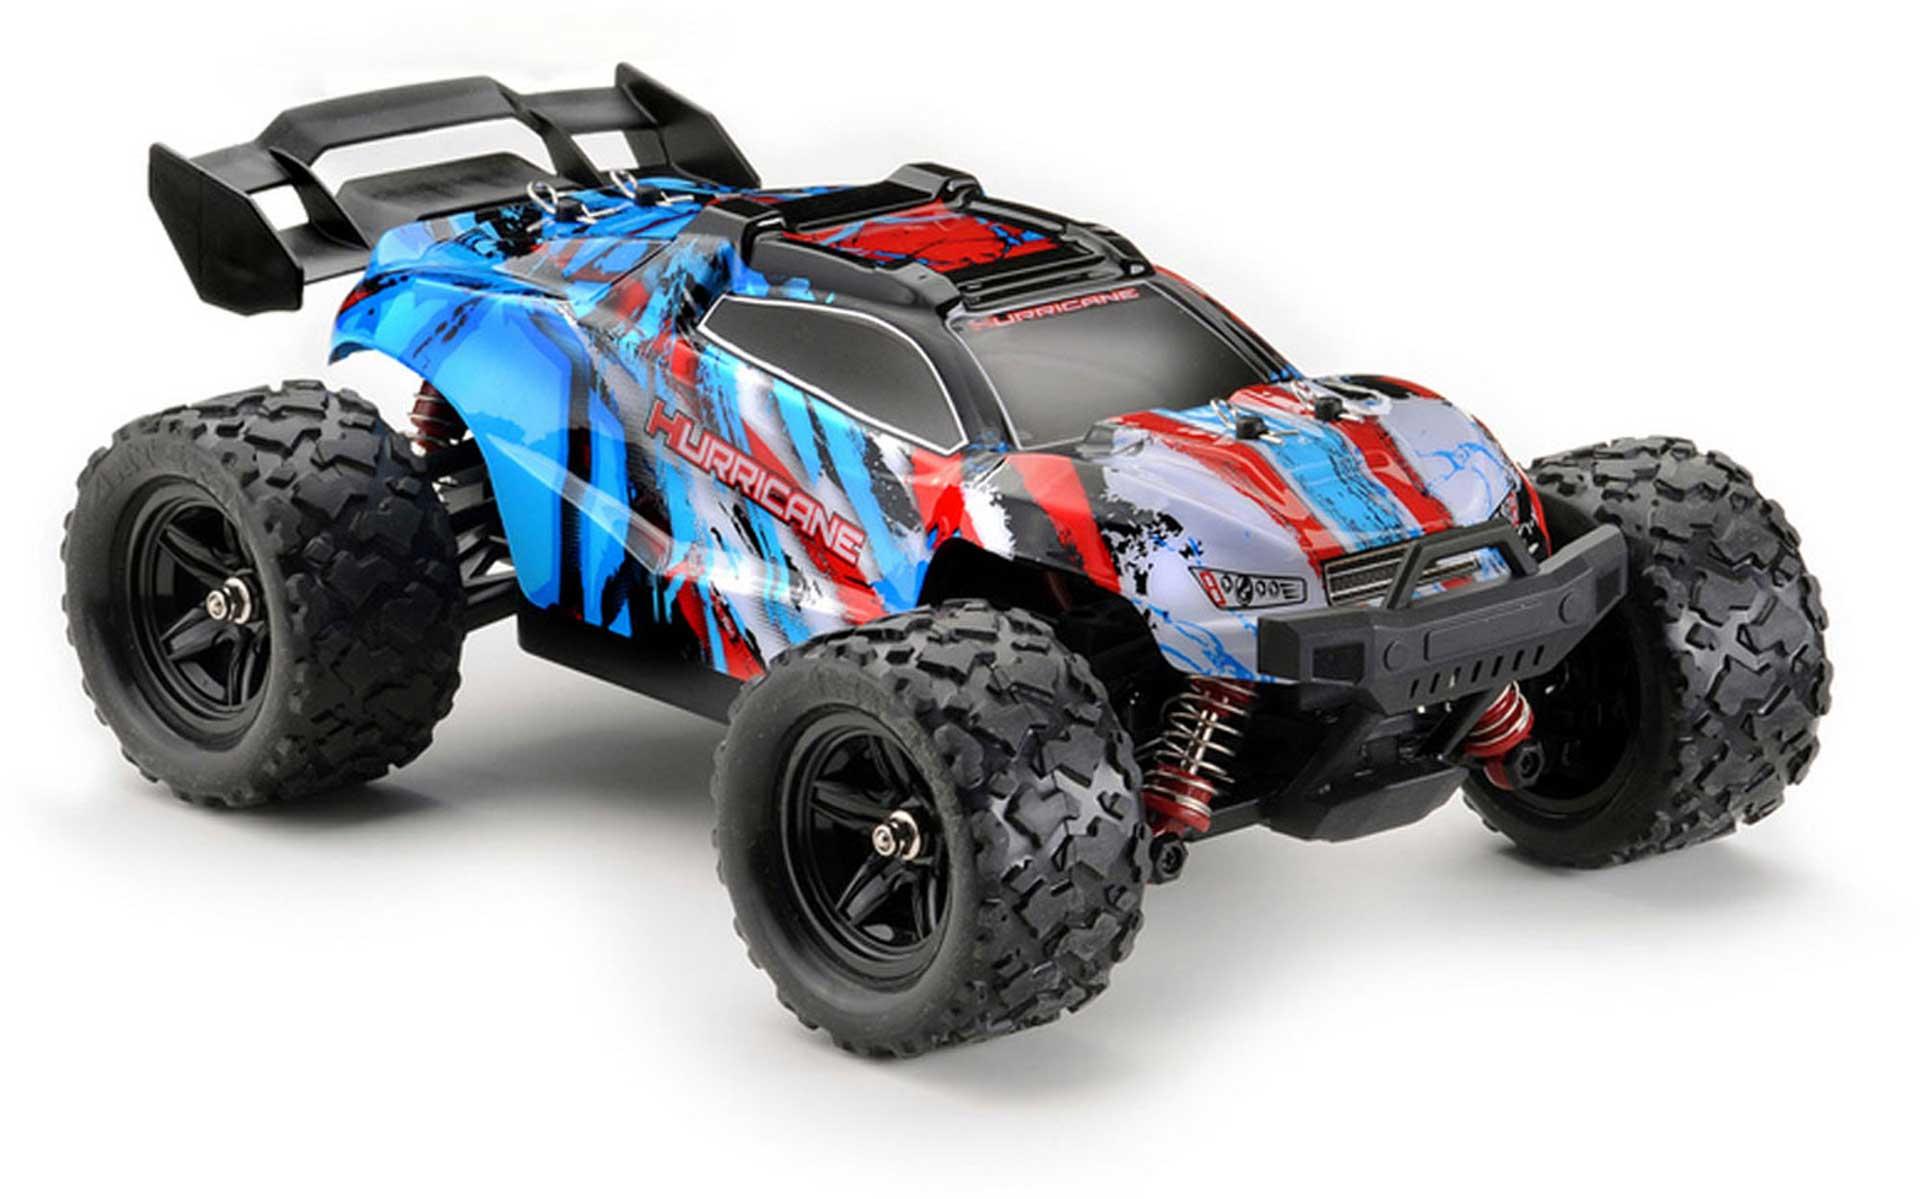 ABSIMA TRUGGY HURRICANE 1/18 4WD RTR BLAU HIGH SPEED RACE TRUCK +35KM/H